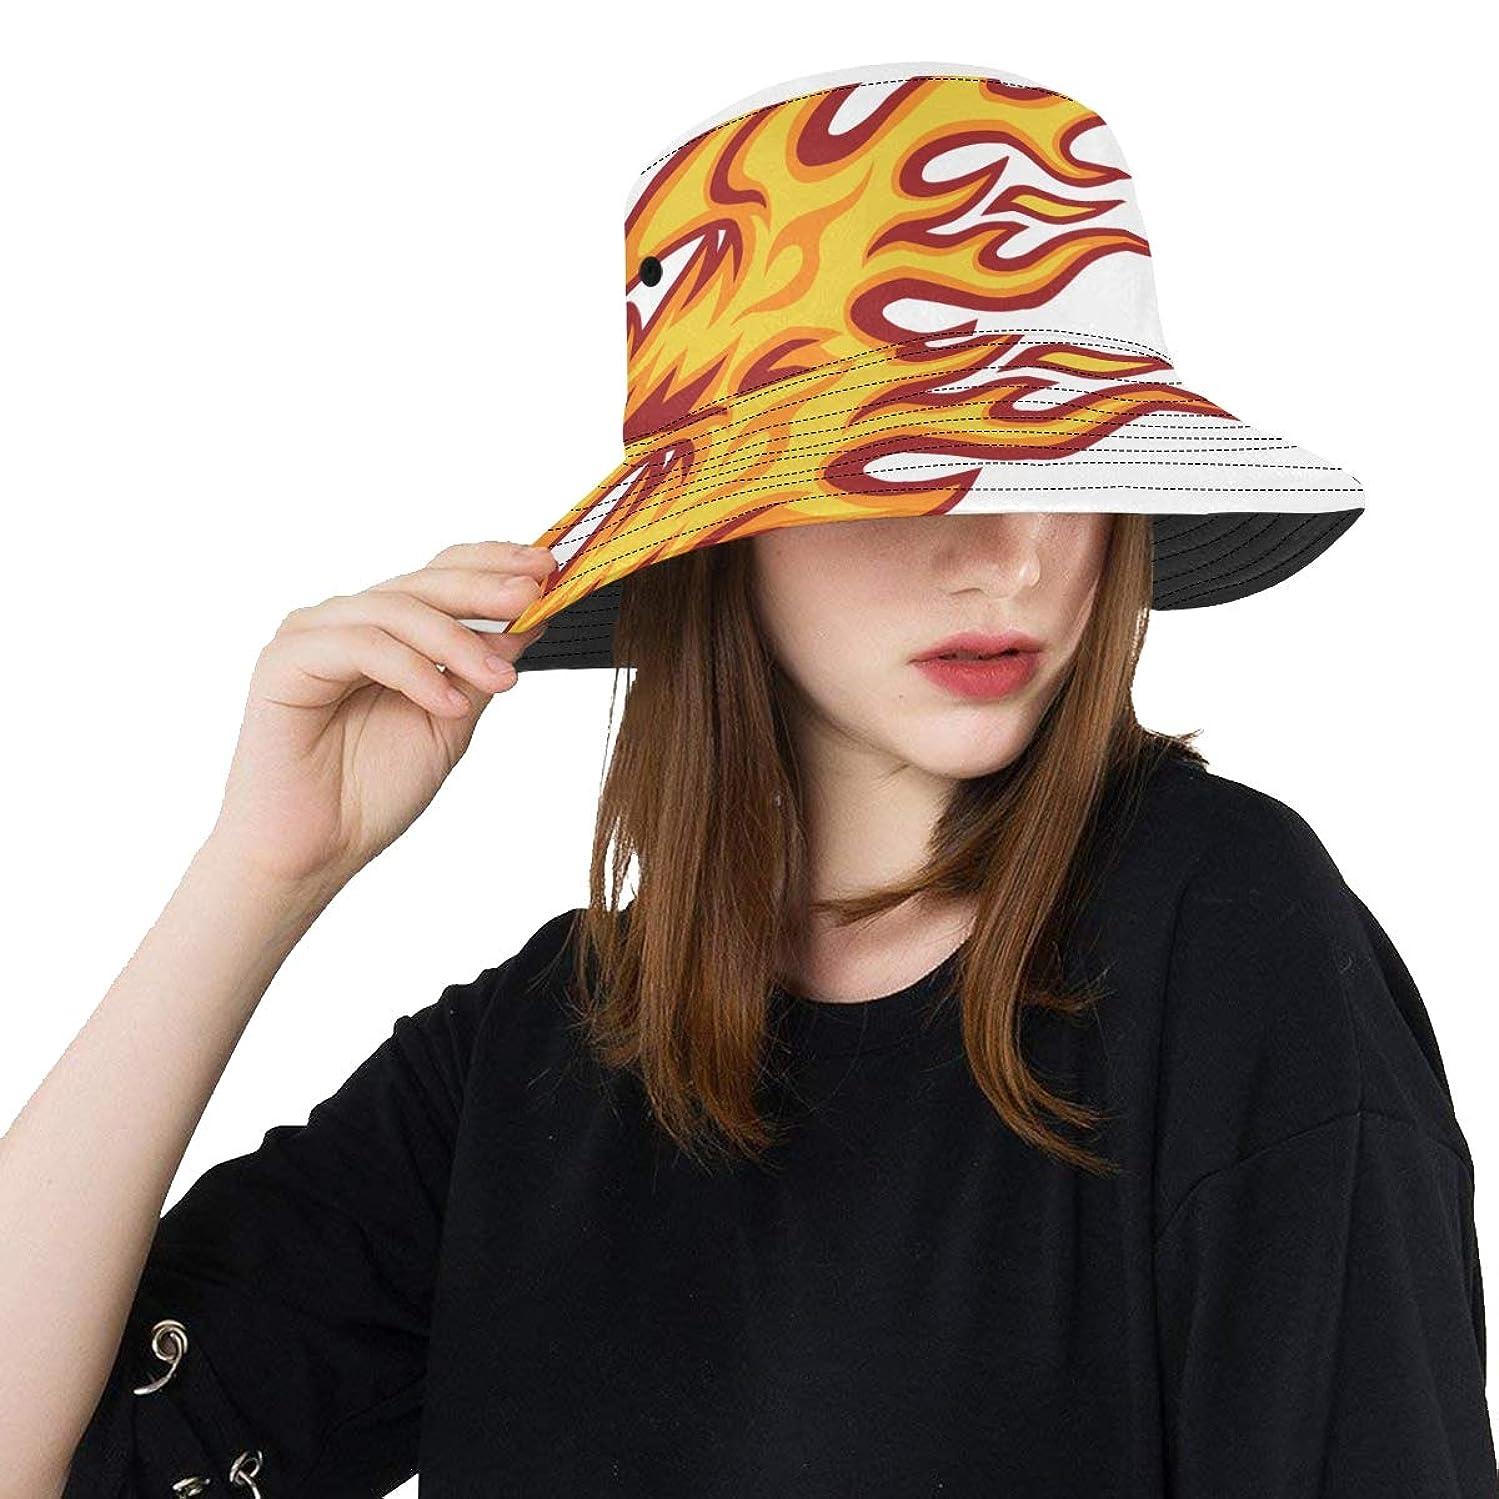 Phoenix Flying High Summer Unisex Fishing Sun Top Bucket Hats for Kid Teens Women and Men with Packable Fisherman Cap for Outdoor Baseball Sport Picnic